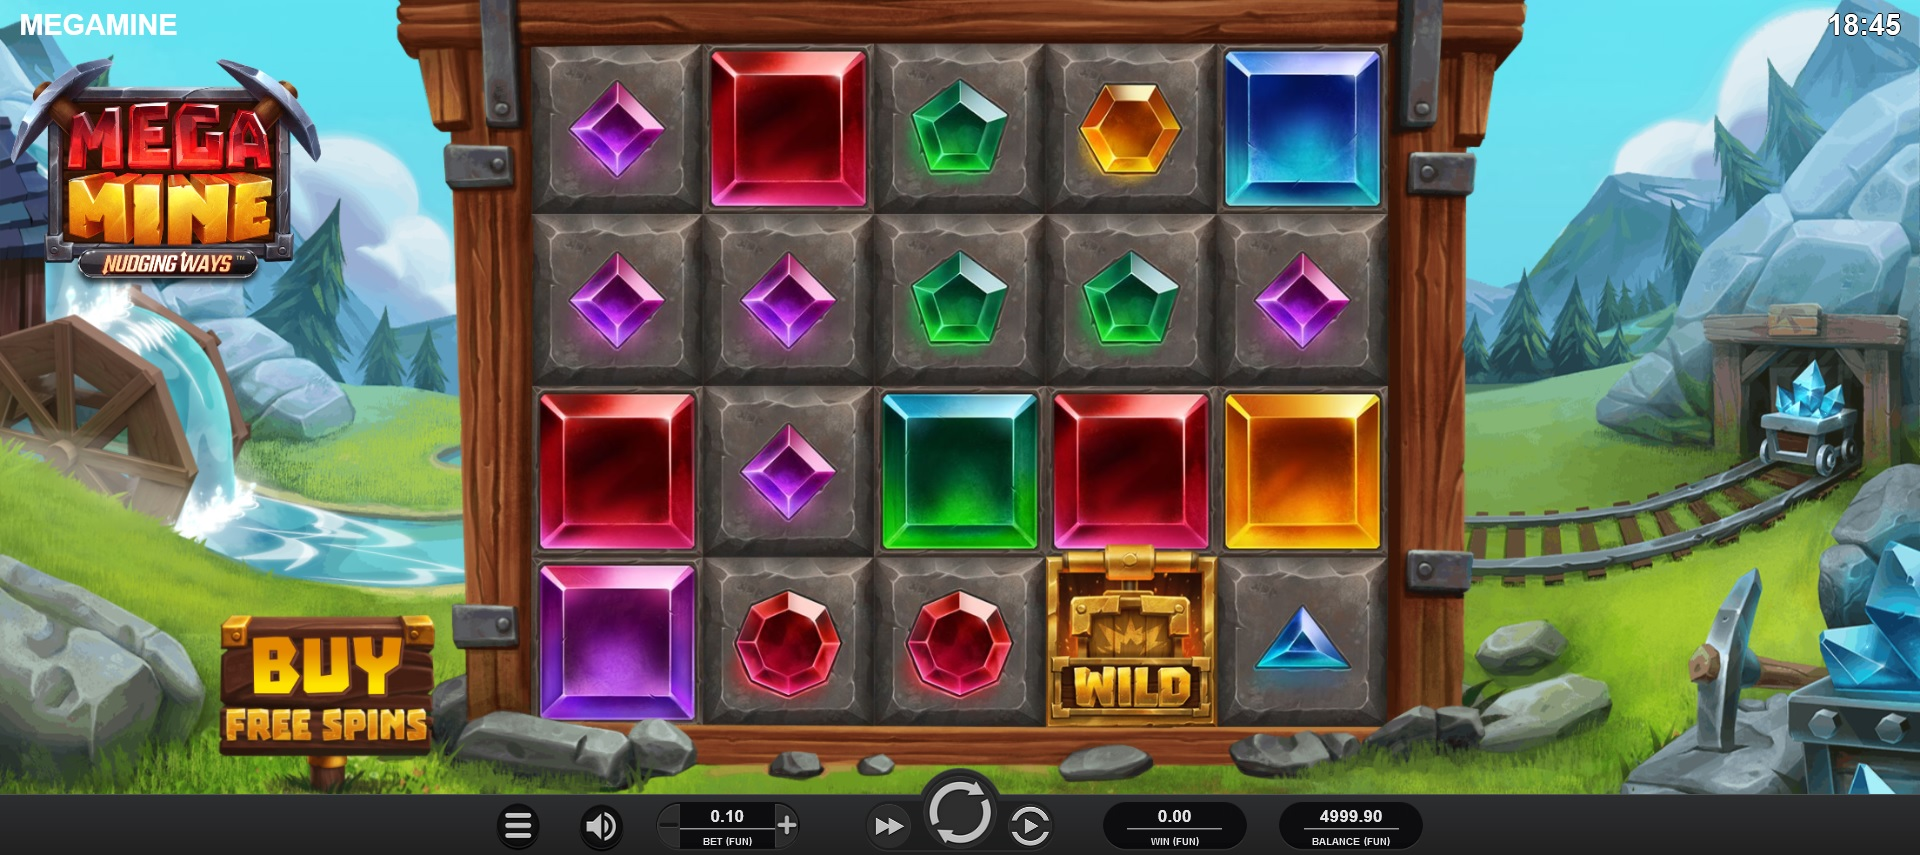 Mega Mine Nudging Ways Reels during Main Game